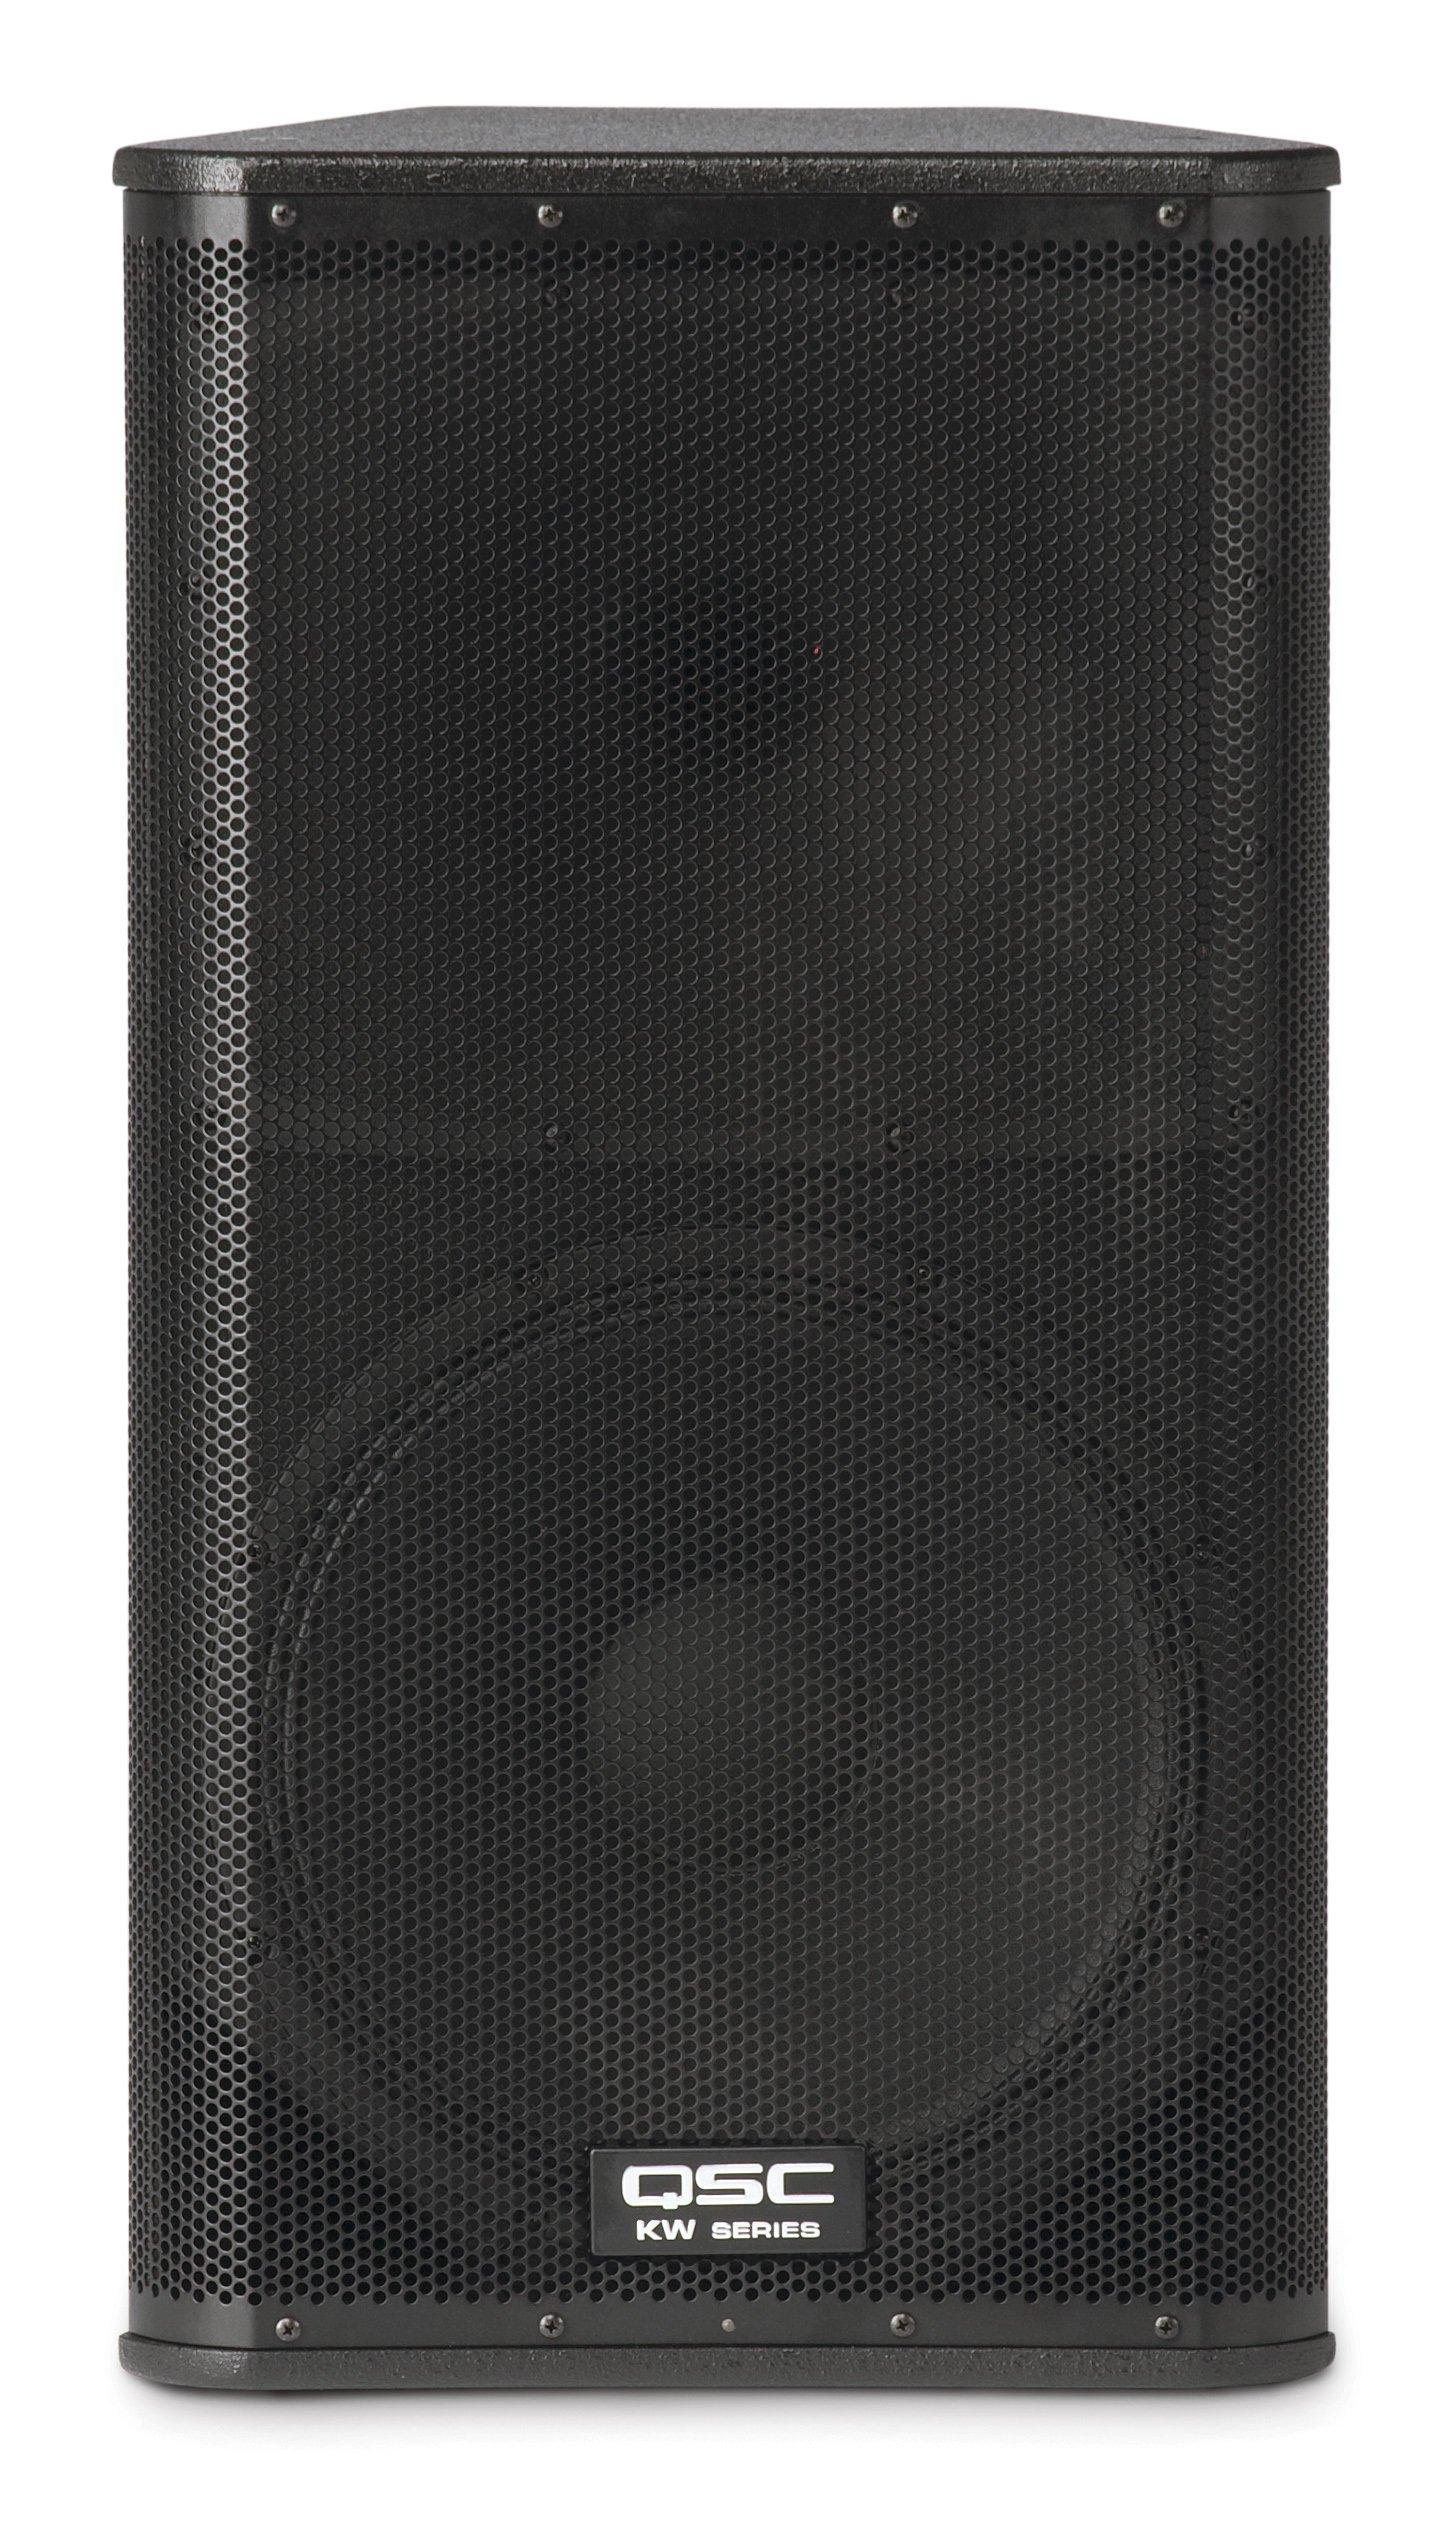 QSC KW152 1000 Watts 15-Inch 2-Way Powered Loudspeaker